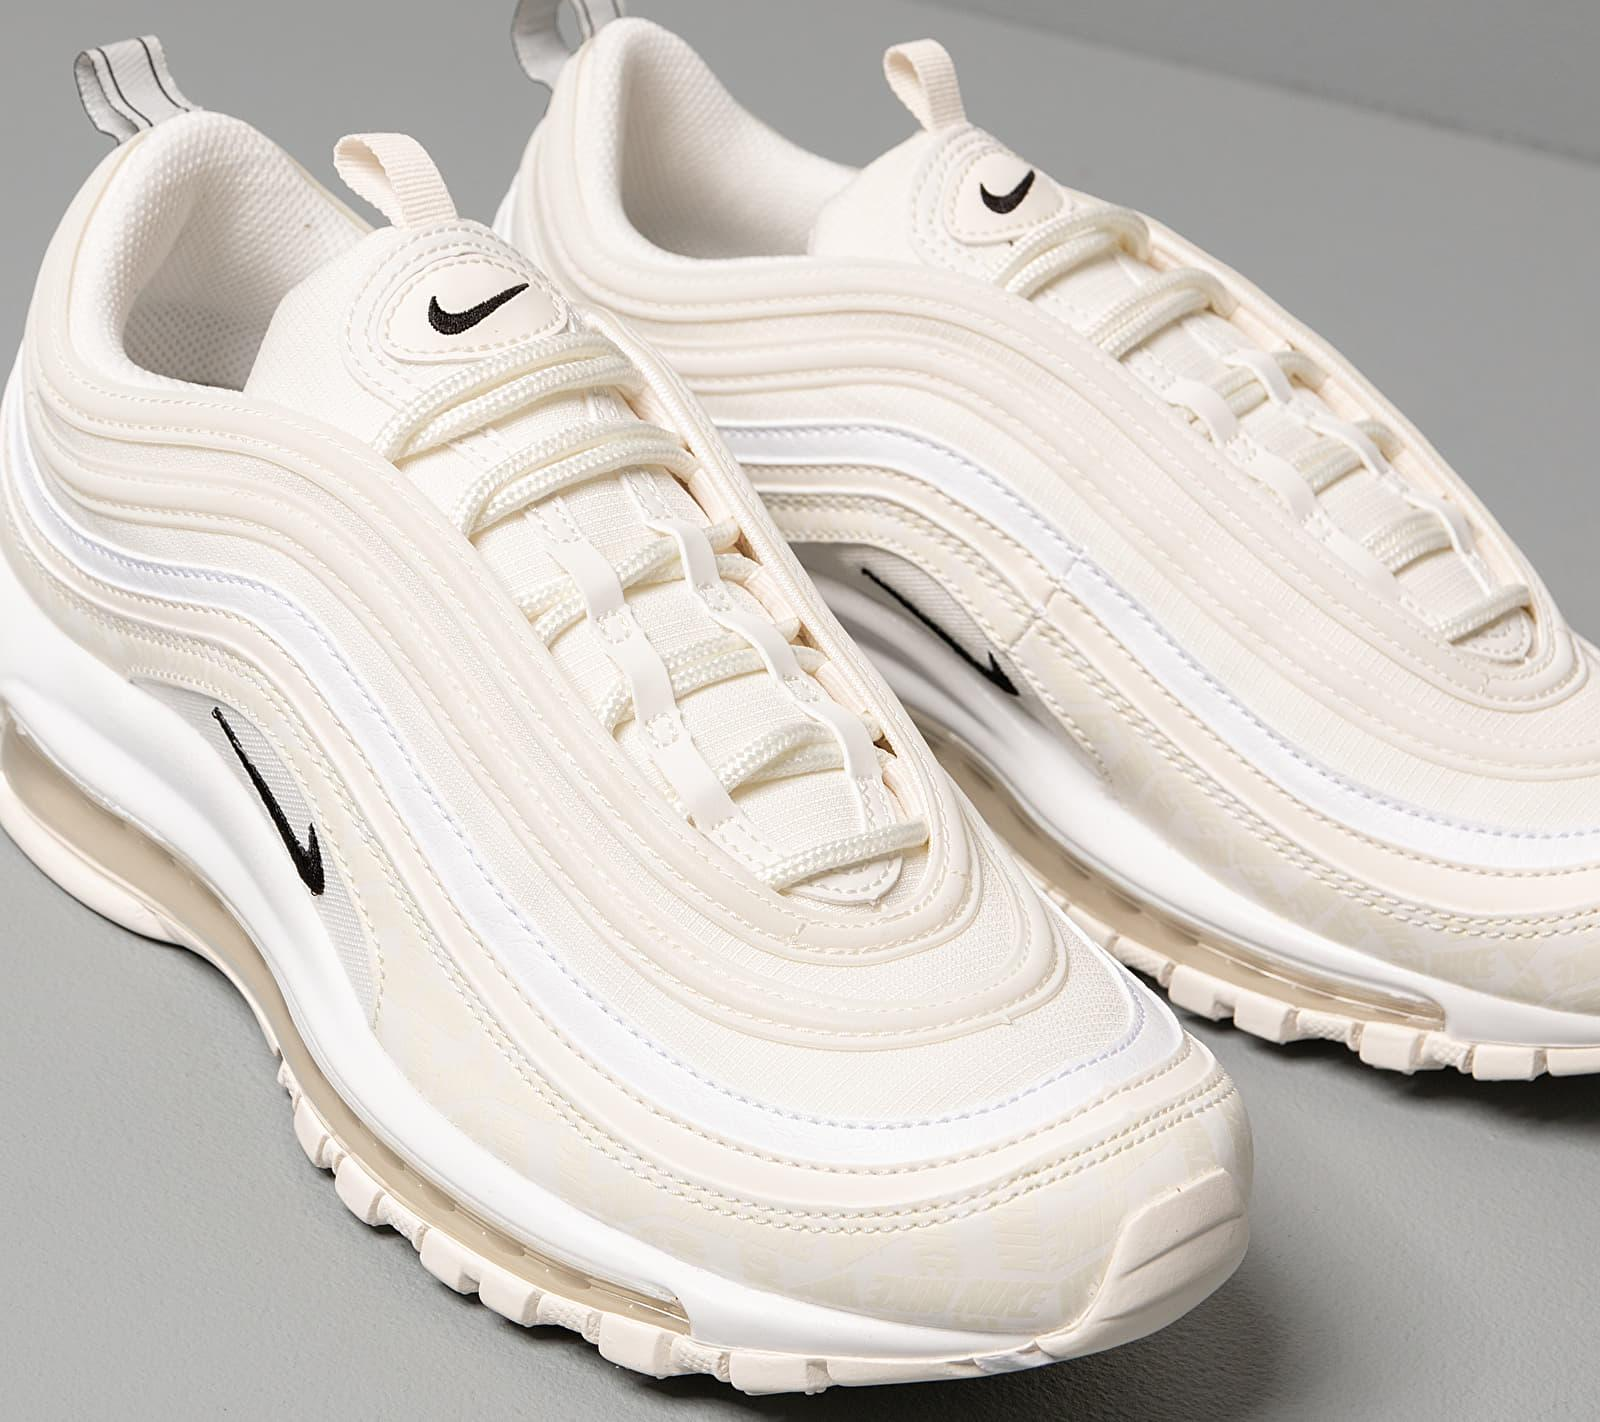 Nike Air Max 97 Sail/ Black-white in Brown for Men - Lyst